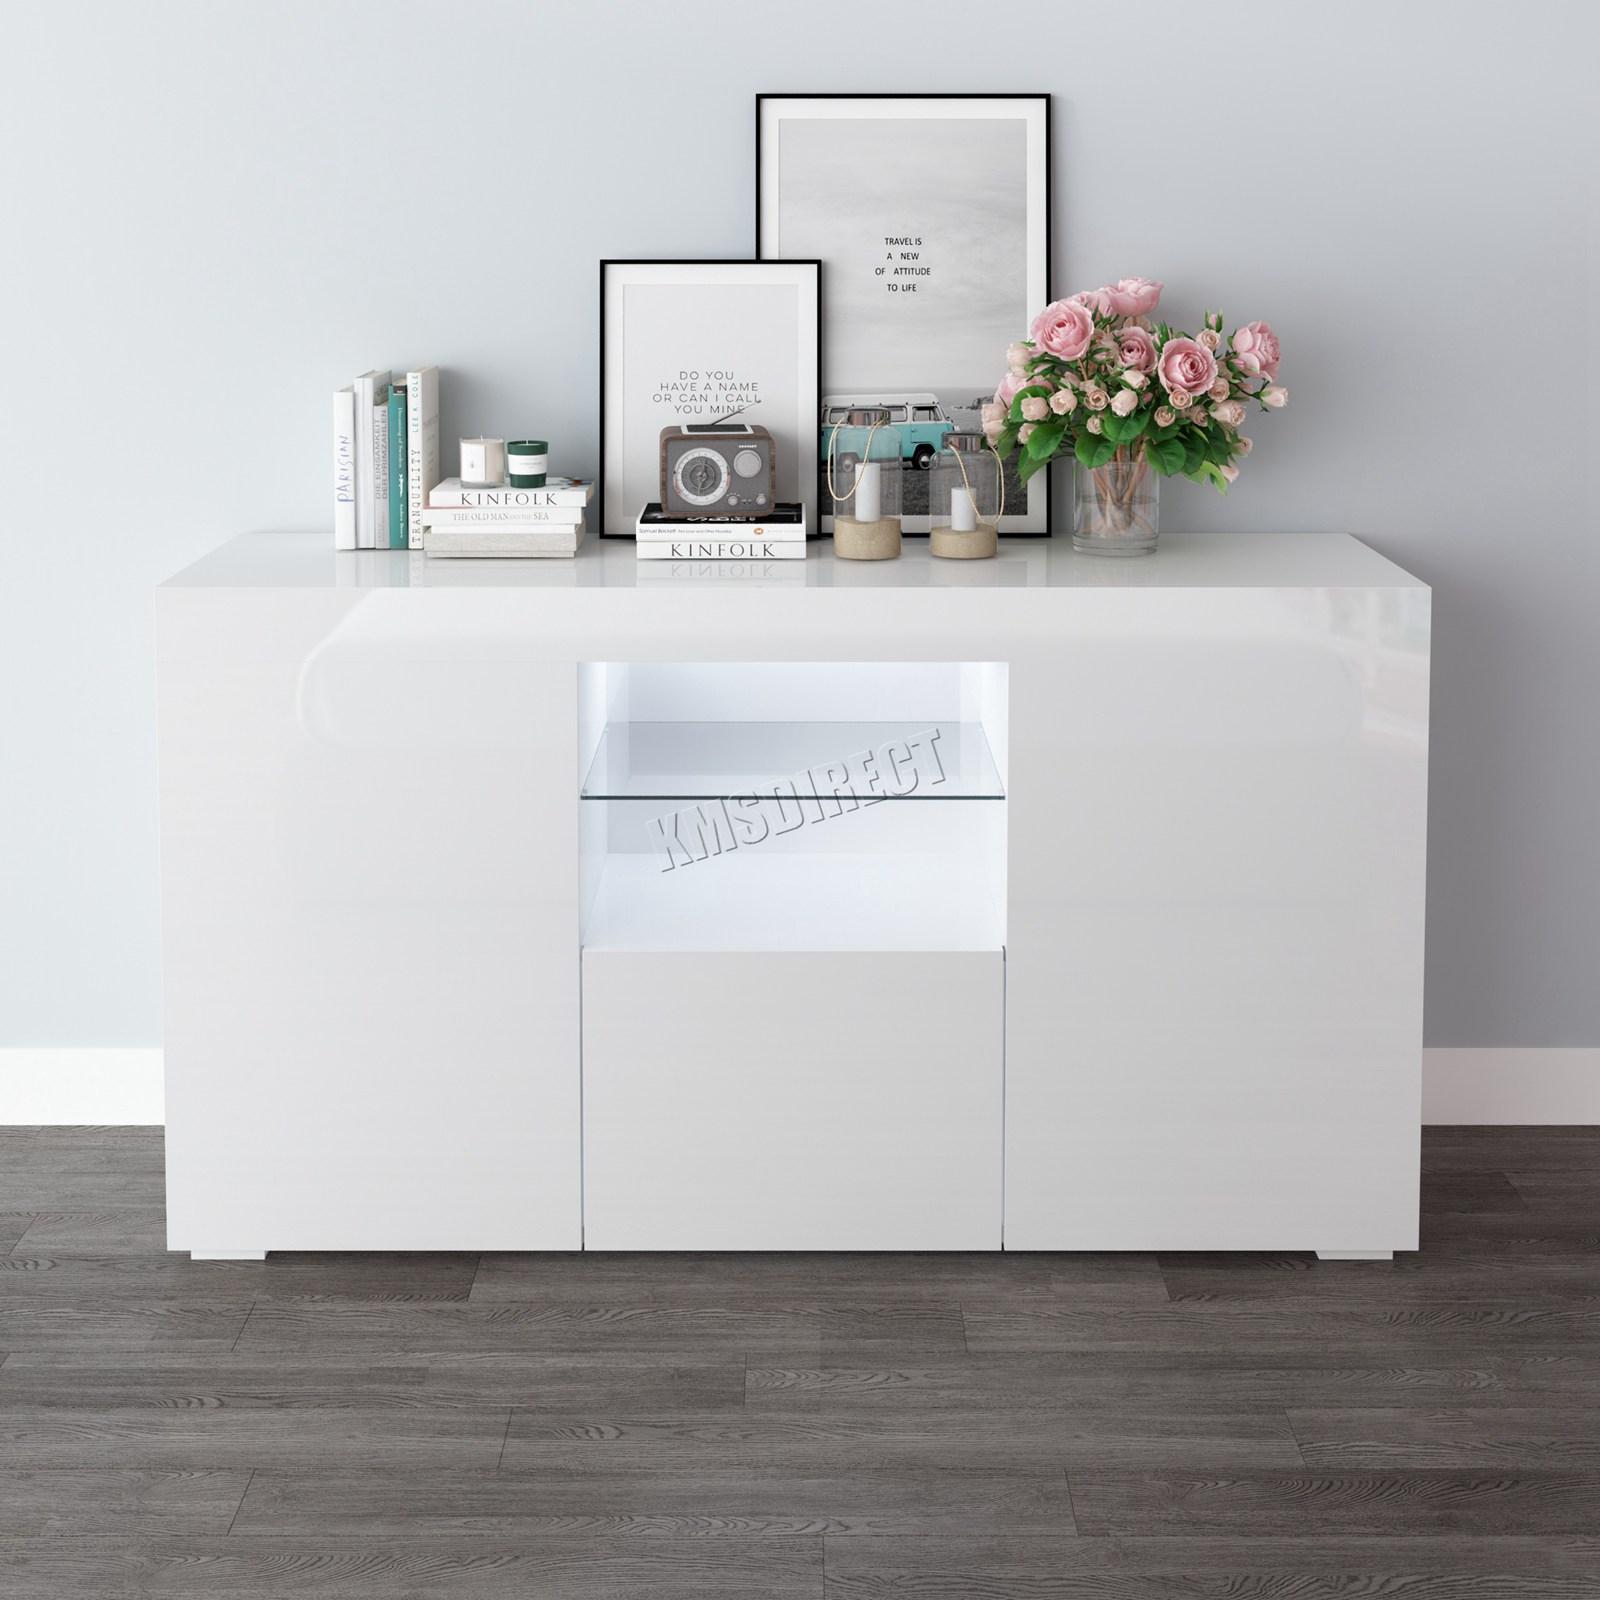 WestWood-PB-High-Gloss-Cabinet-LED-Bookshelf-Sideboard-Cupboard-Home-Unit-PHC03 thumbnail 29